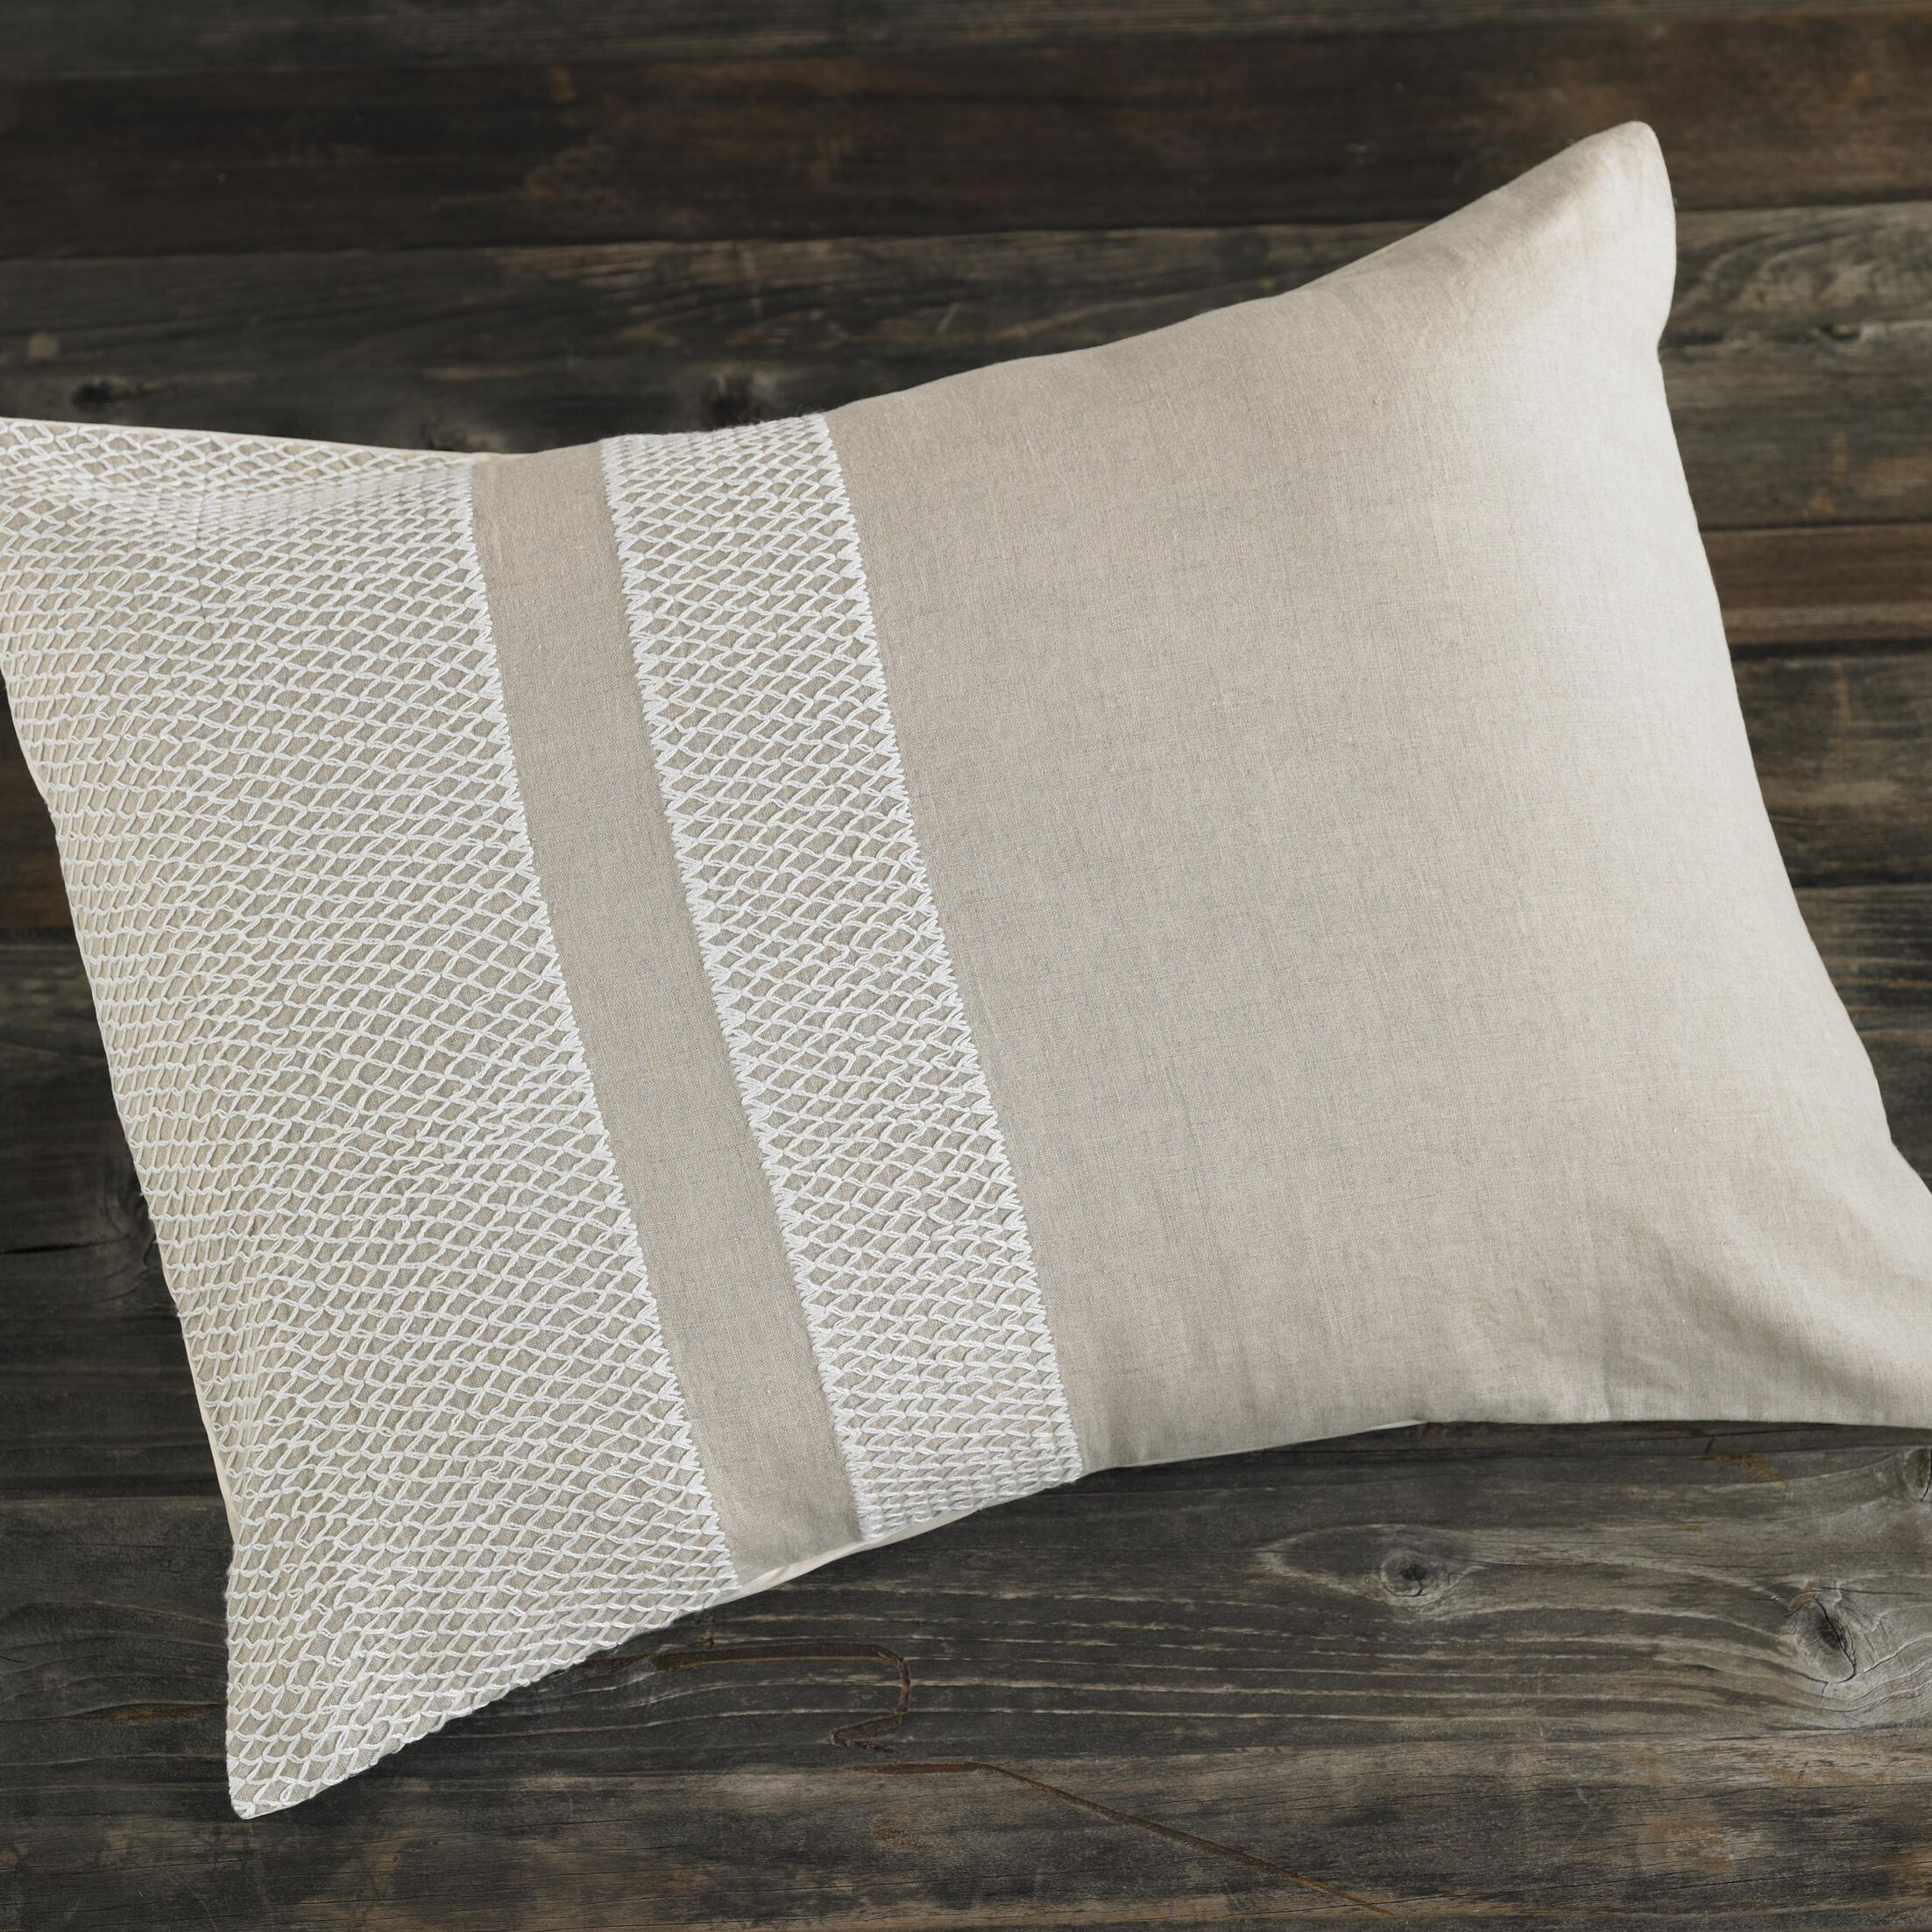 Labyrinth Embroidered Linen Sham Size: Euro, Color: White/Indigo